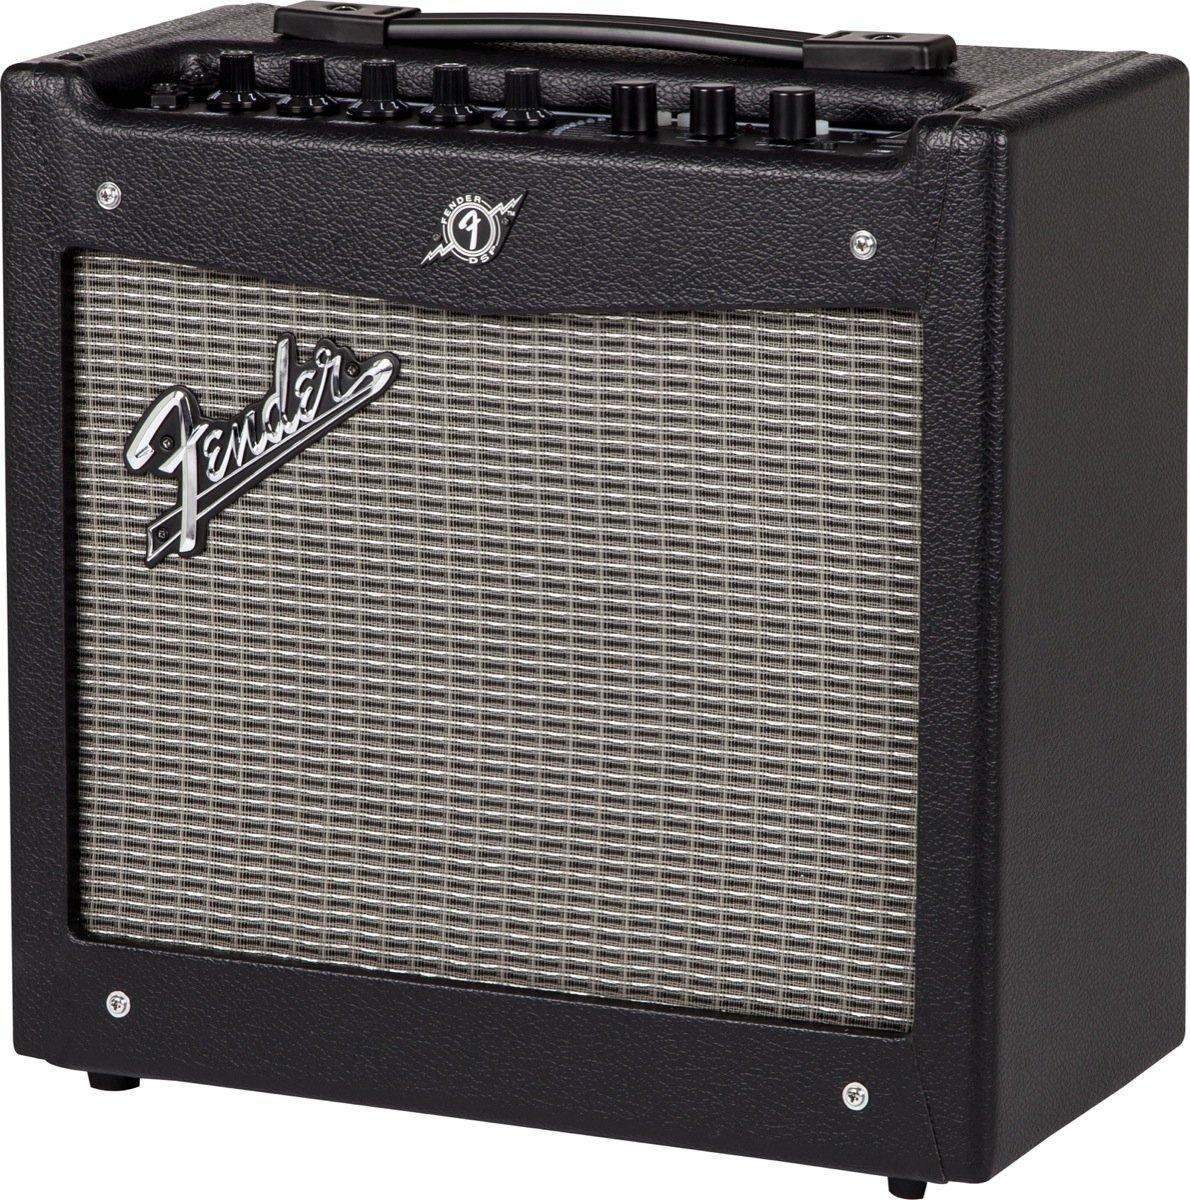 Amplificador guitarra Fender Mustang I v.2 20 W product image